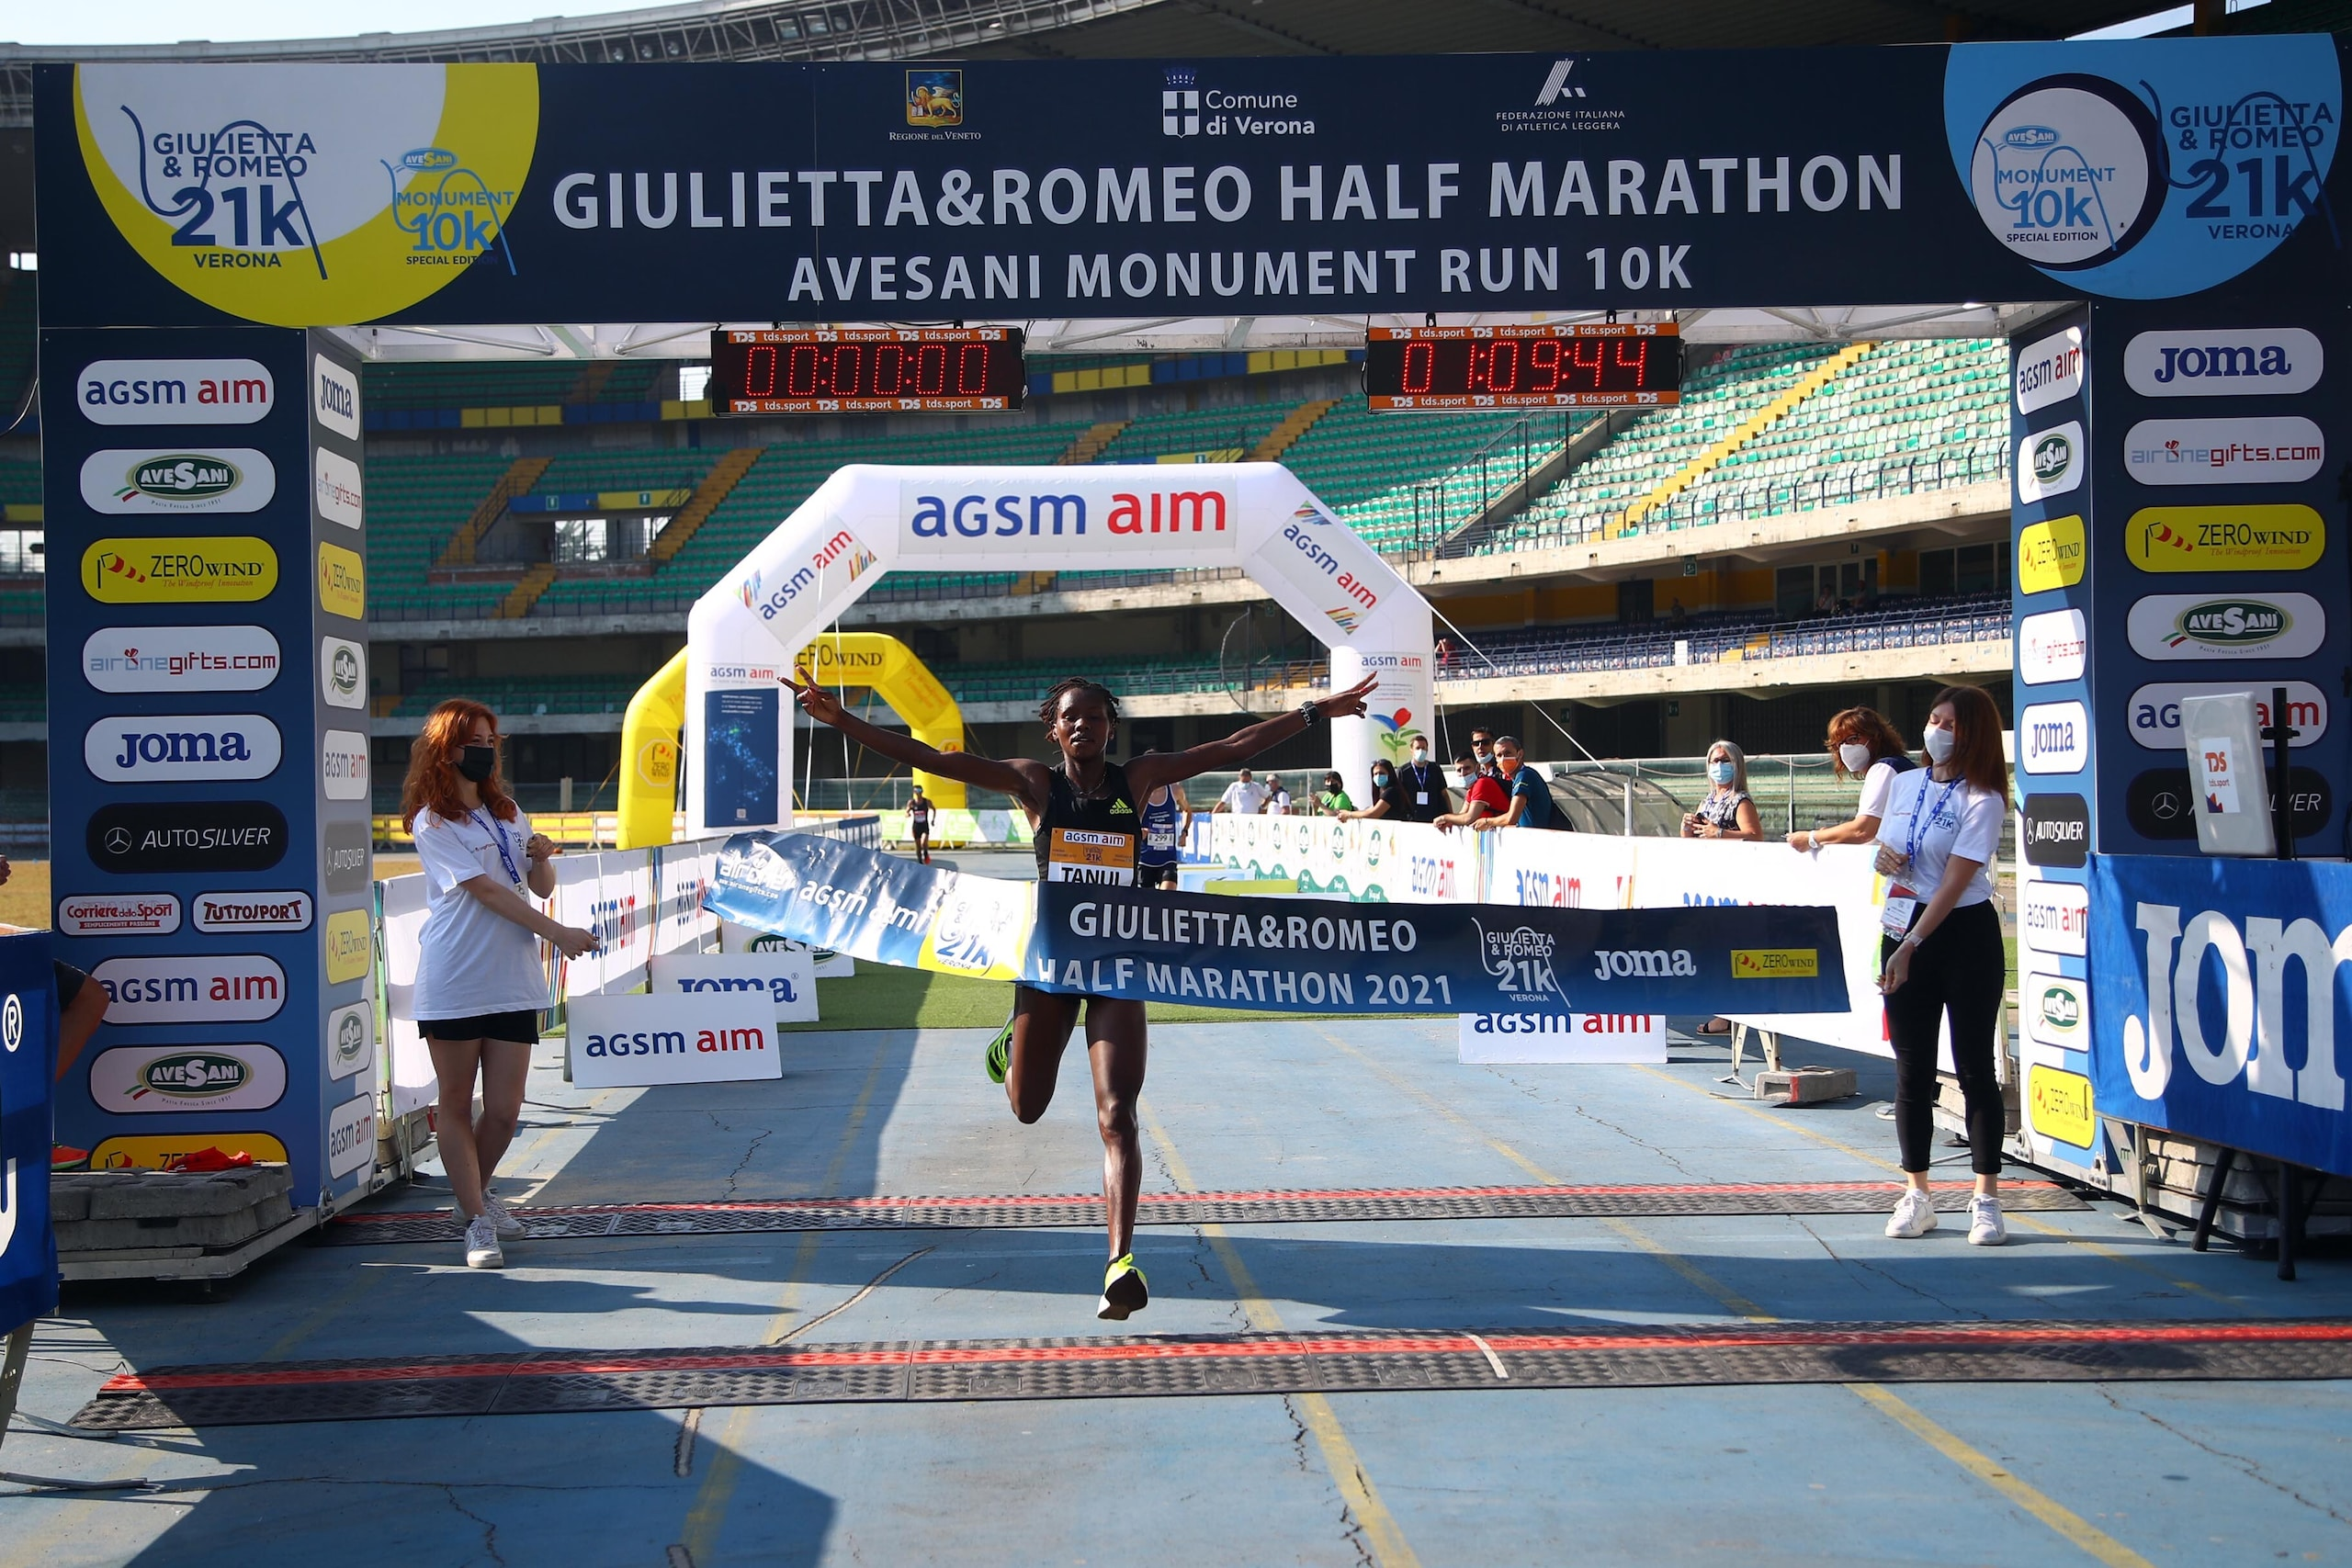 Con Eyob Faniel e Giovanna Epis la Giulietta&Romeo Half Marathon è…olimpica. Trionfa Angela Tanui